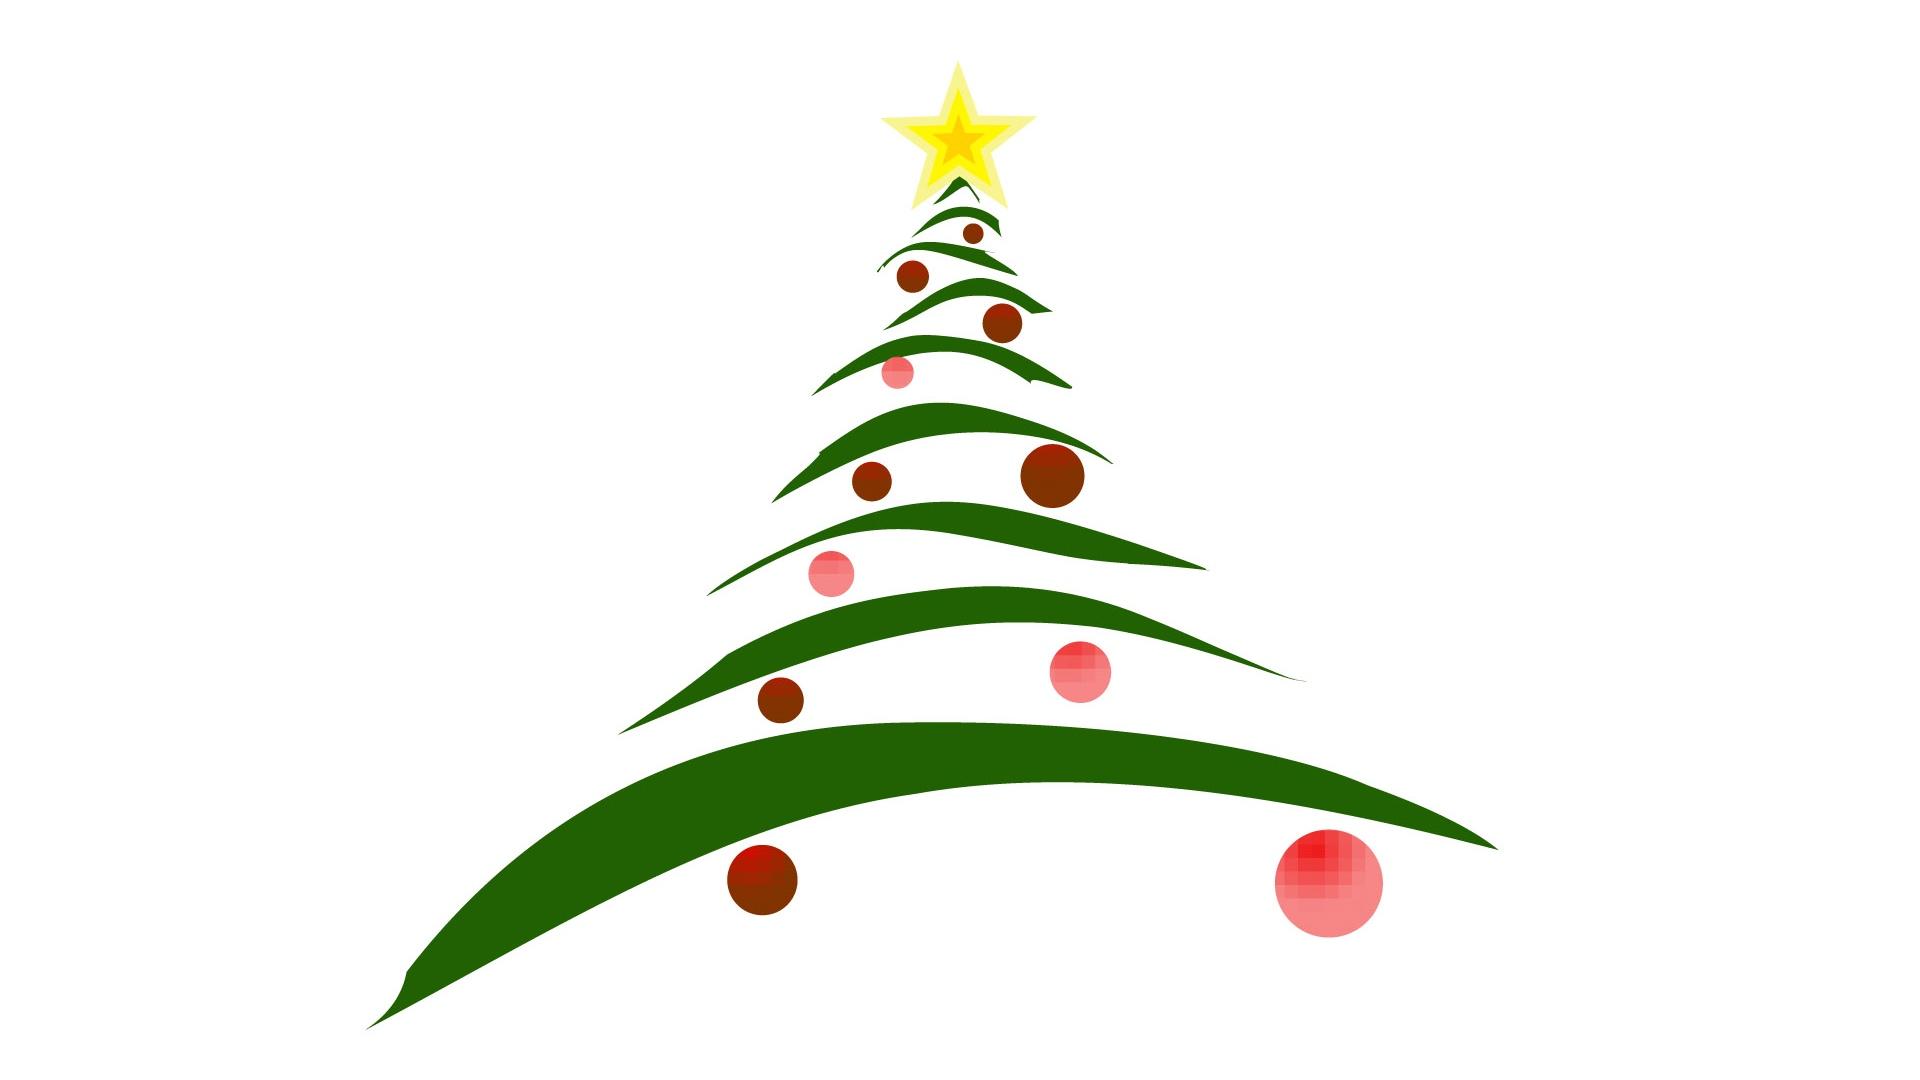 Sfondi Natalizi Per Email.Sfondi Natale Albero 5 Ersu Enna